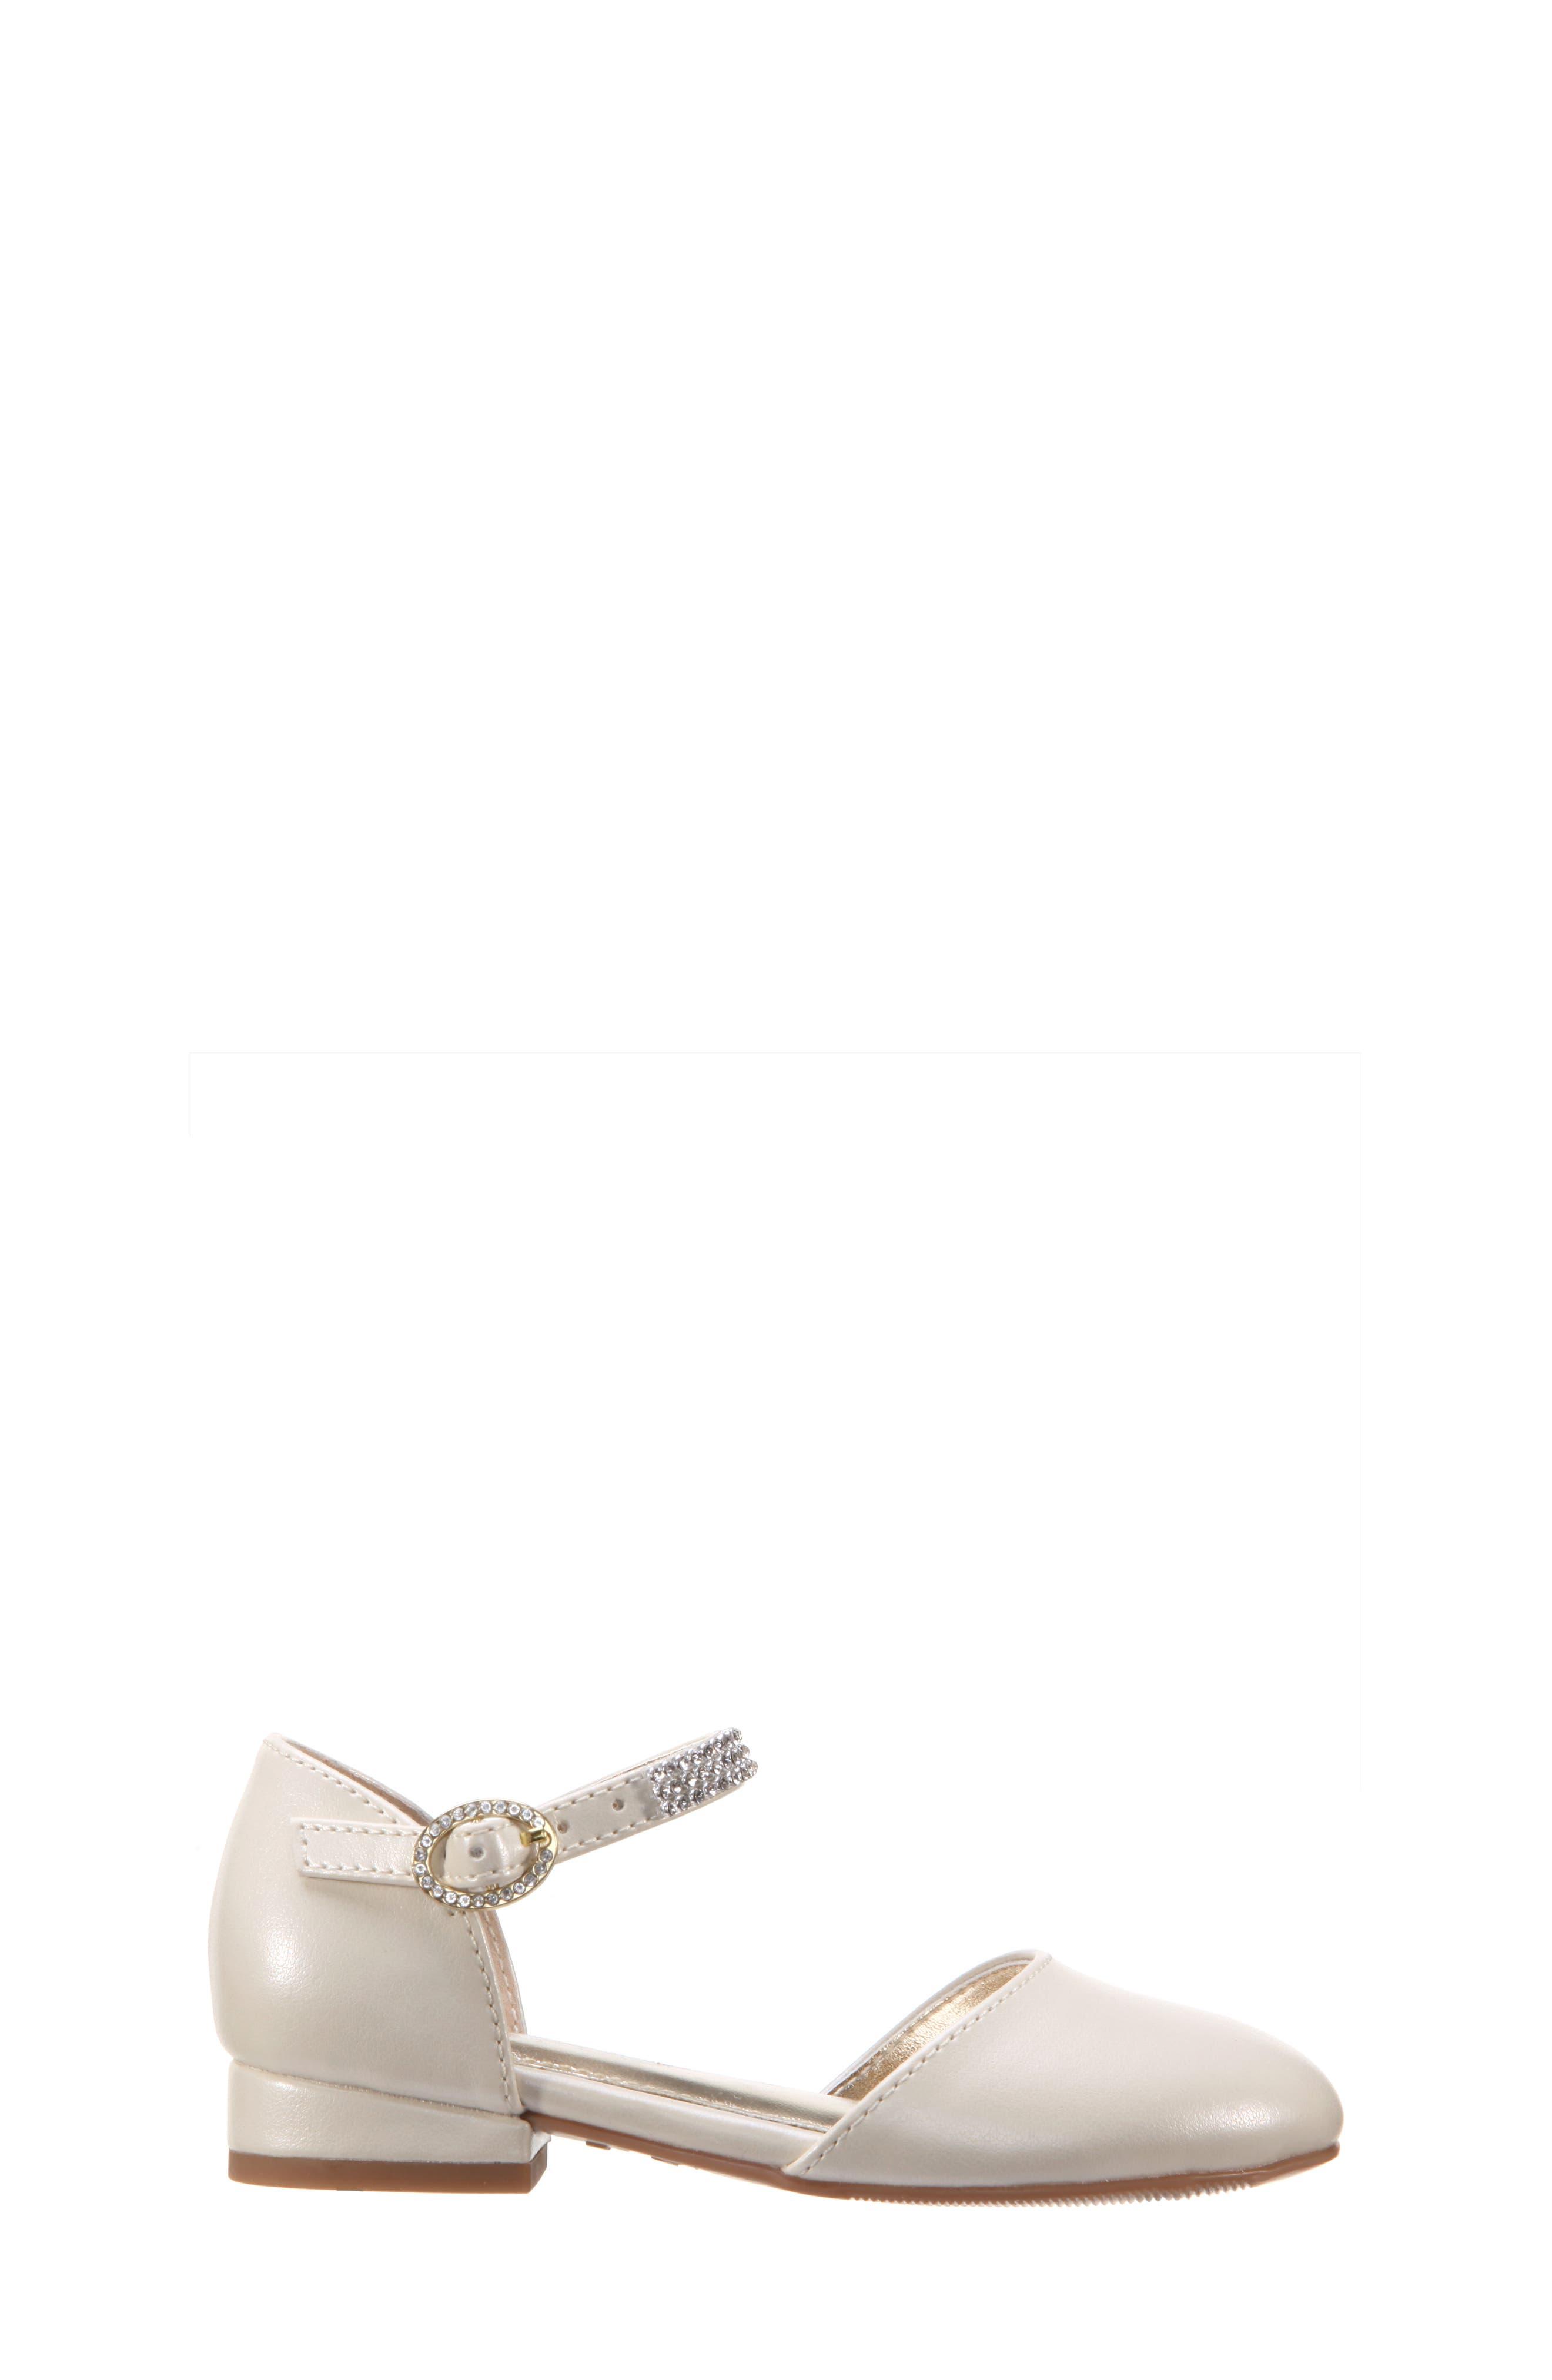 Cara Crystal Embellished d'Orsay Sandal,                             Alternate thumbnail 3, color,                             Bone Pearlized